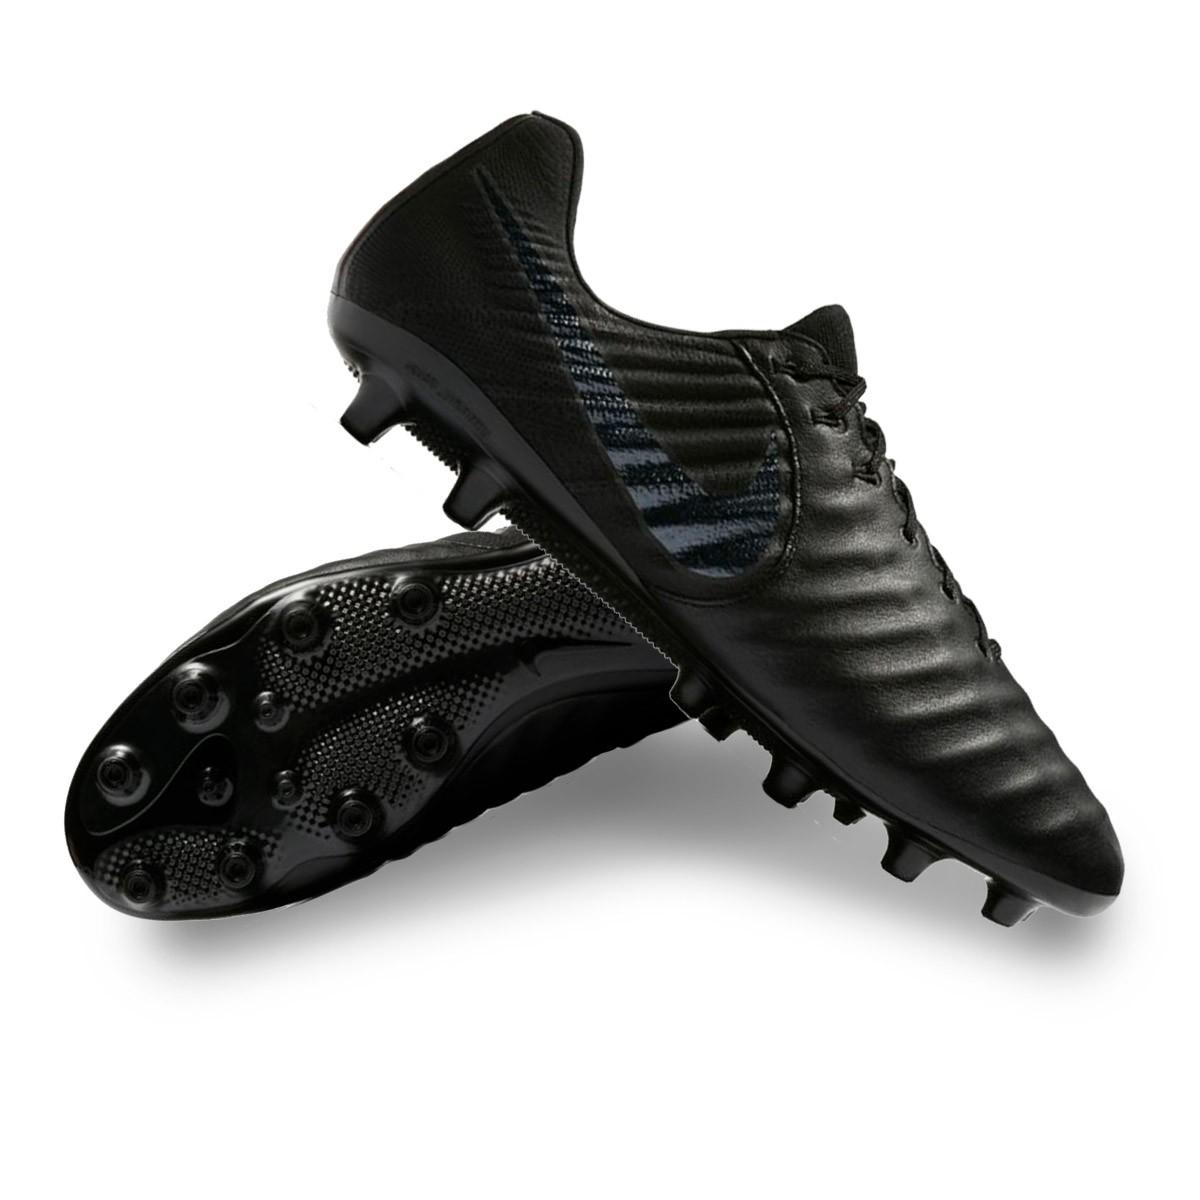 Sucio Limitado Experto  Football Boots Nike Tiempo Legend VII Elite AG-Pro Black - Football store  Fútbol Emotion